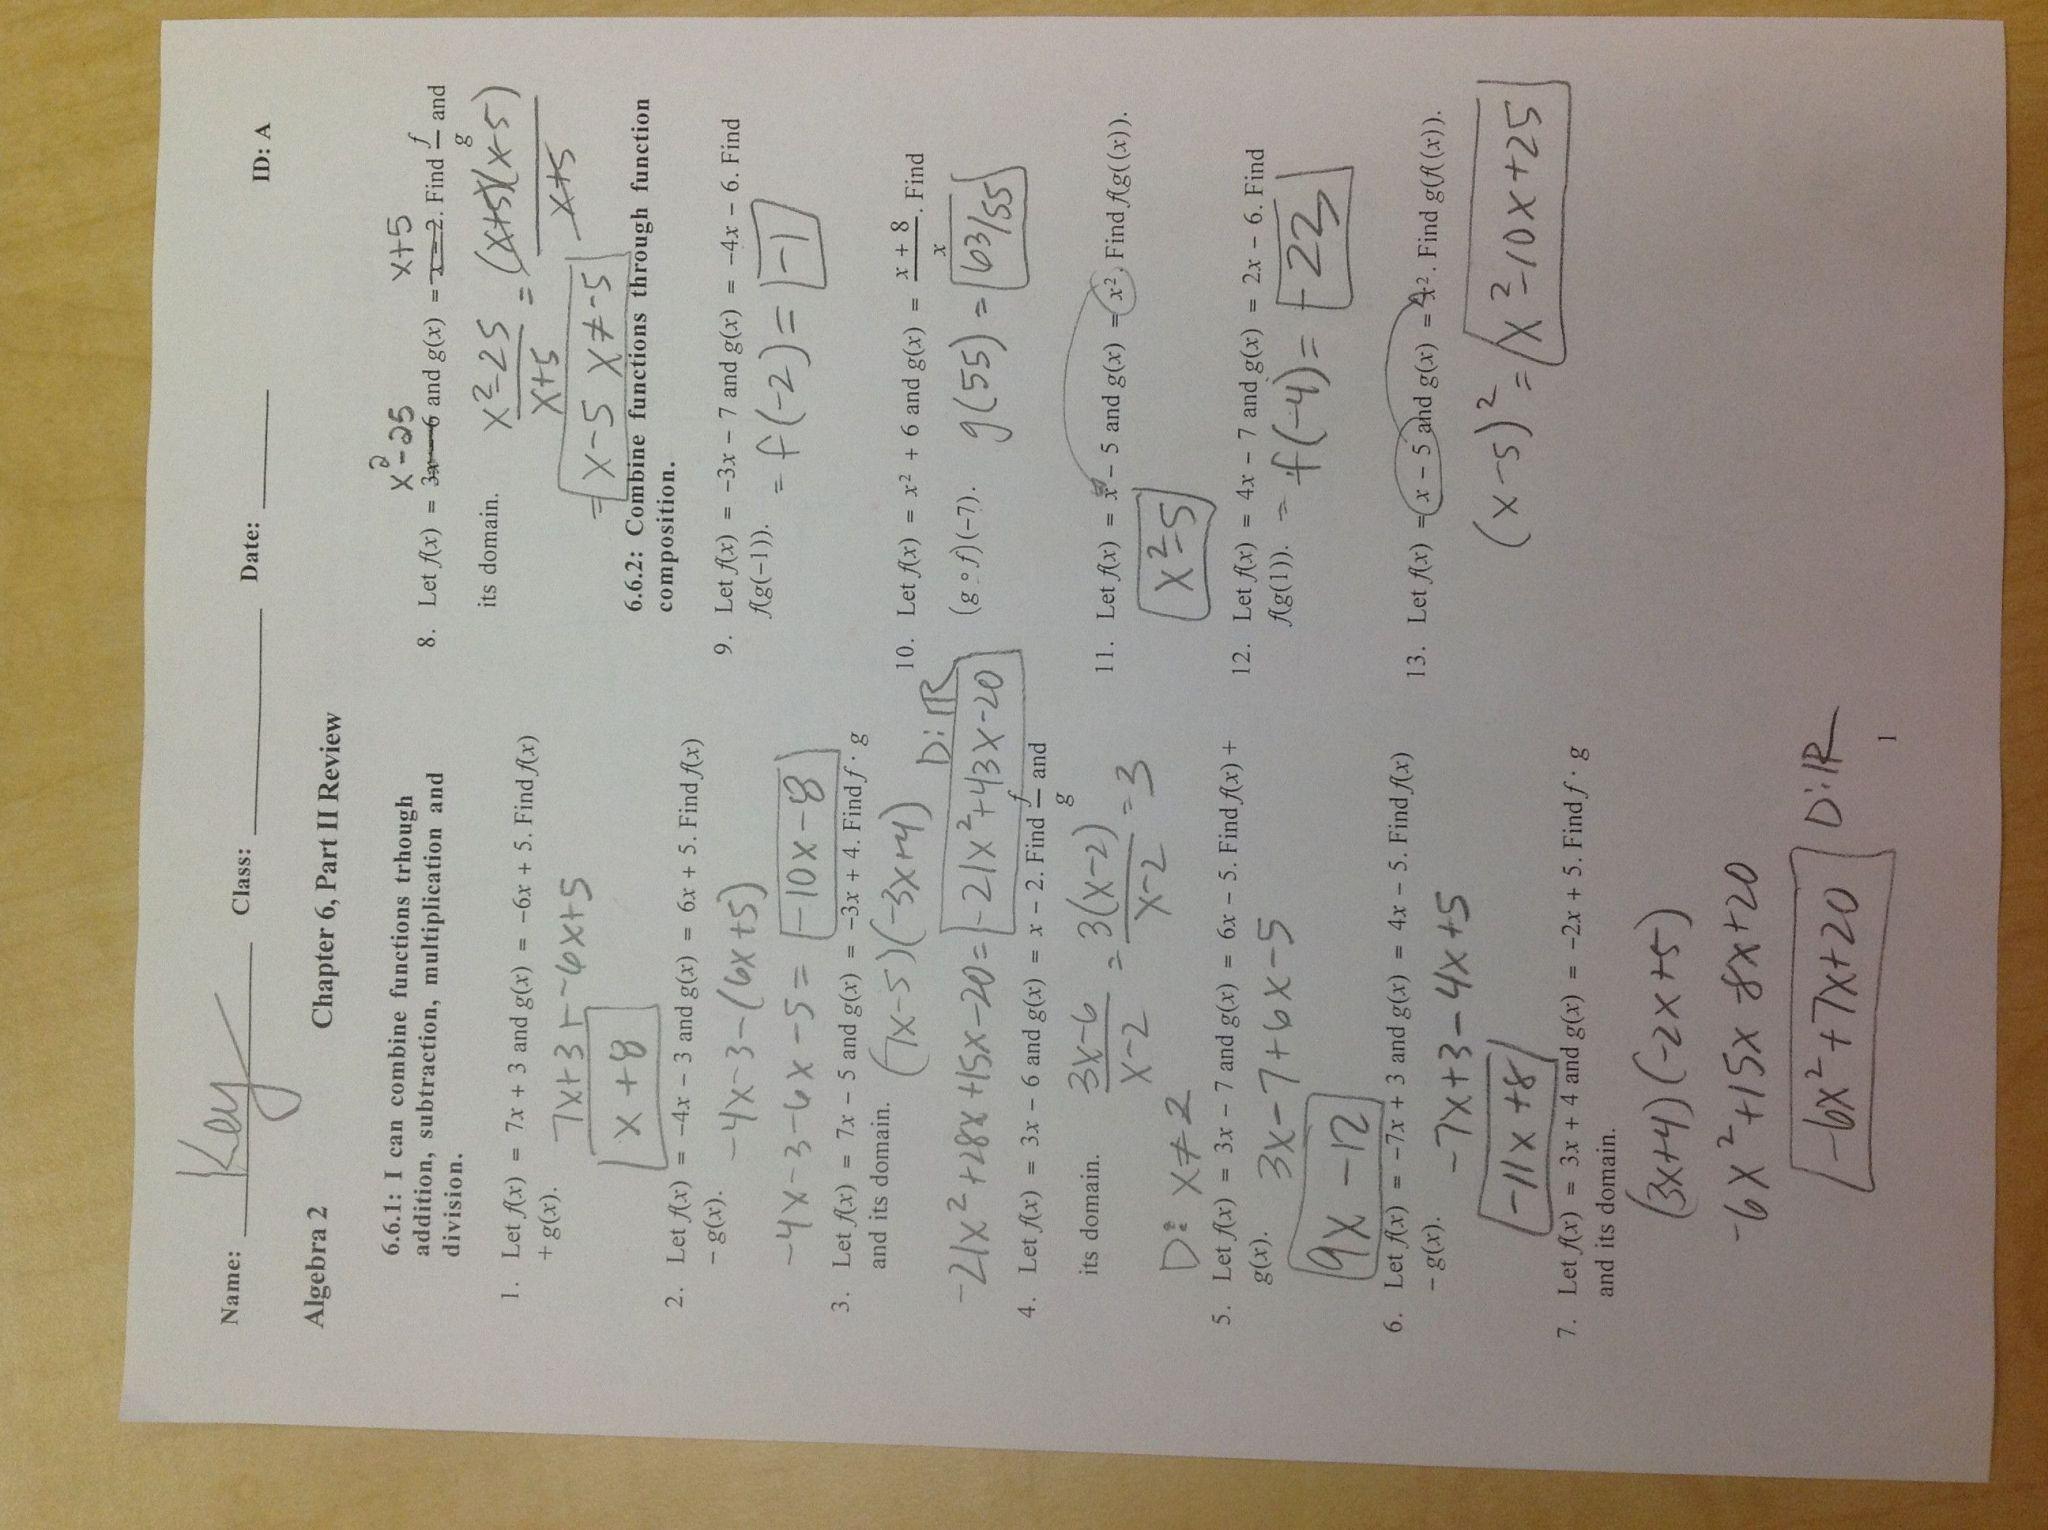 Interpreting Graphs Worksheet Answer Key